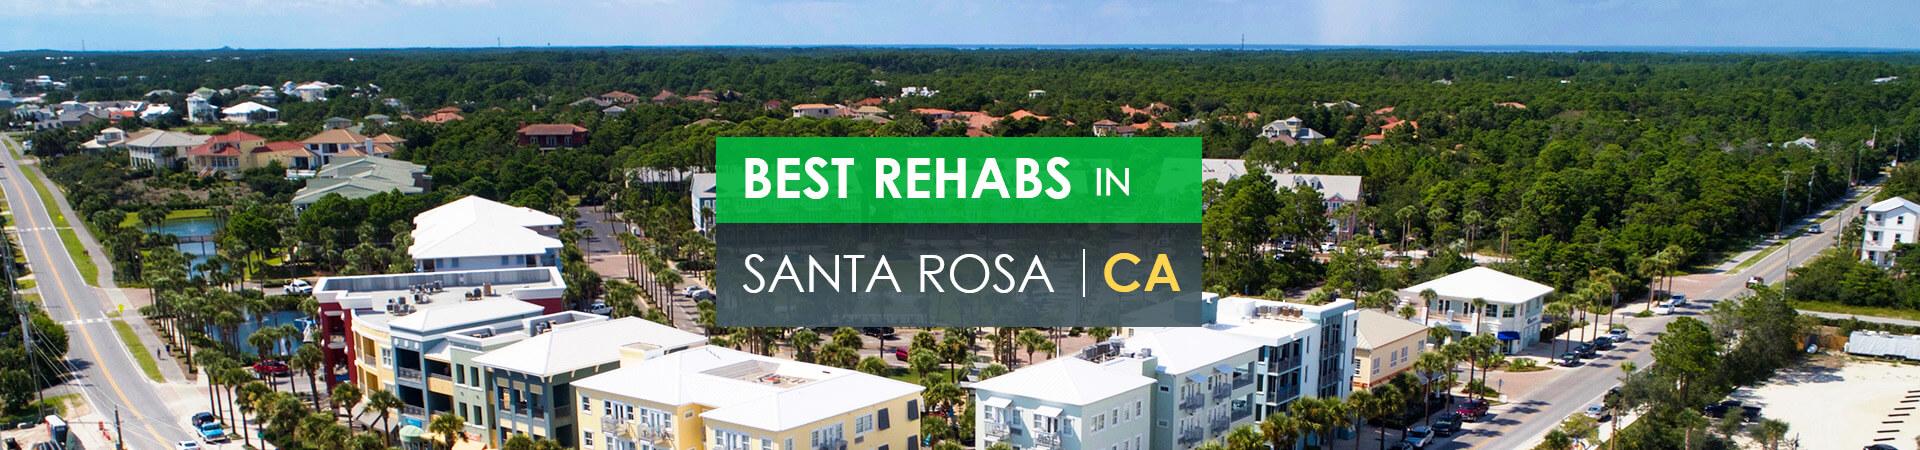 Best rehabs in Santa Rosa, CA